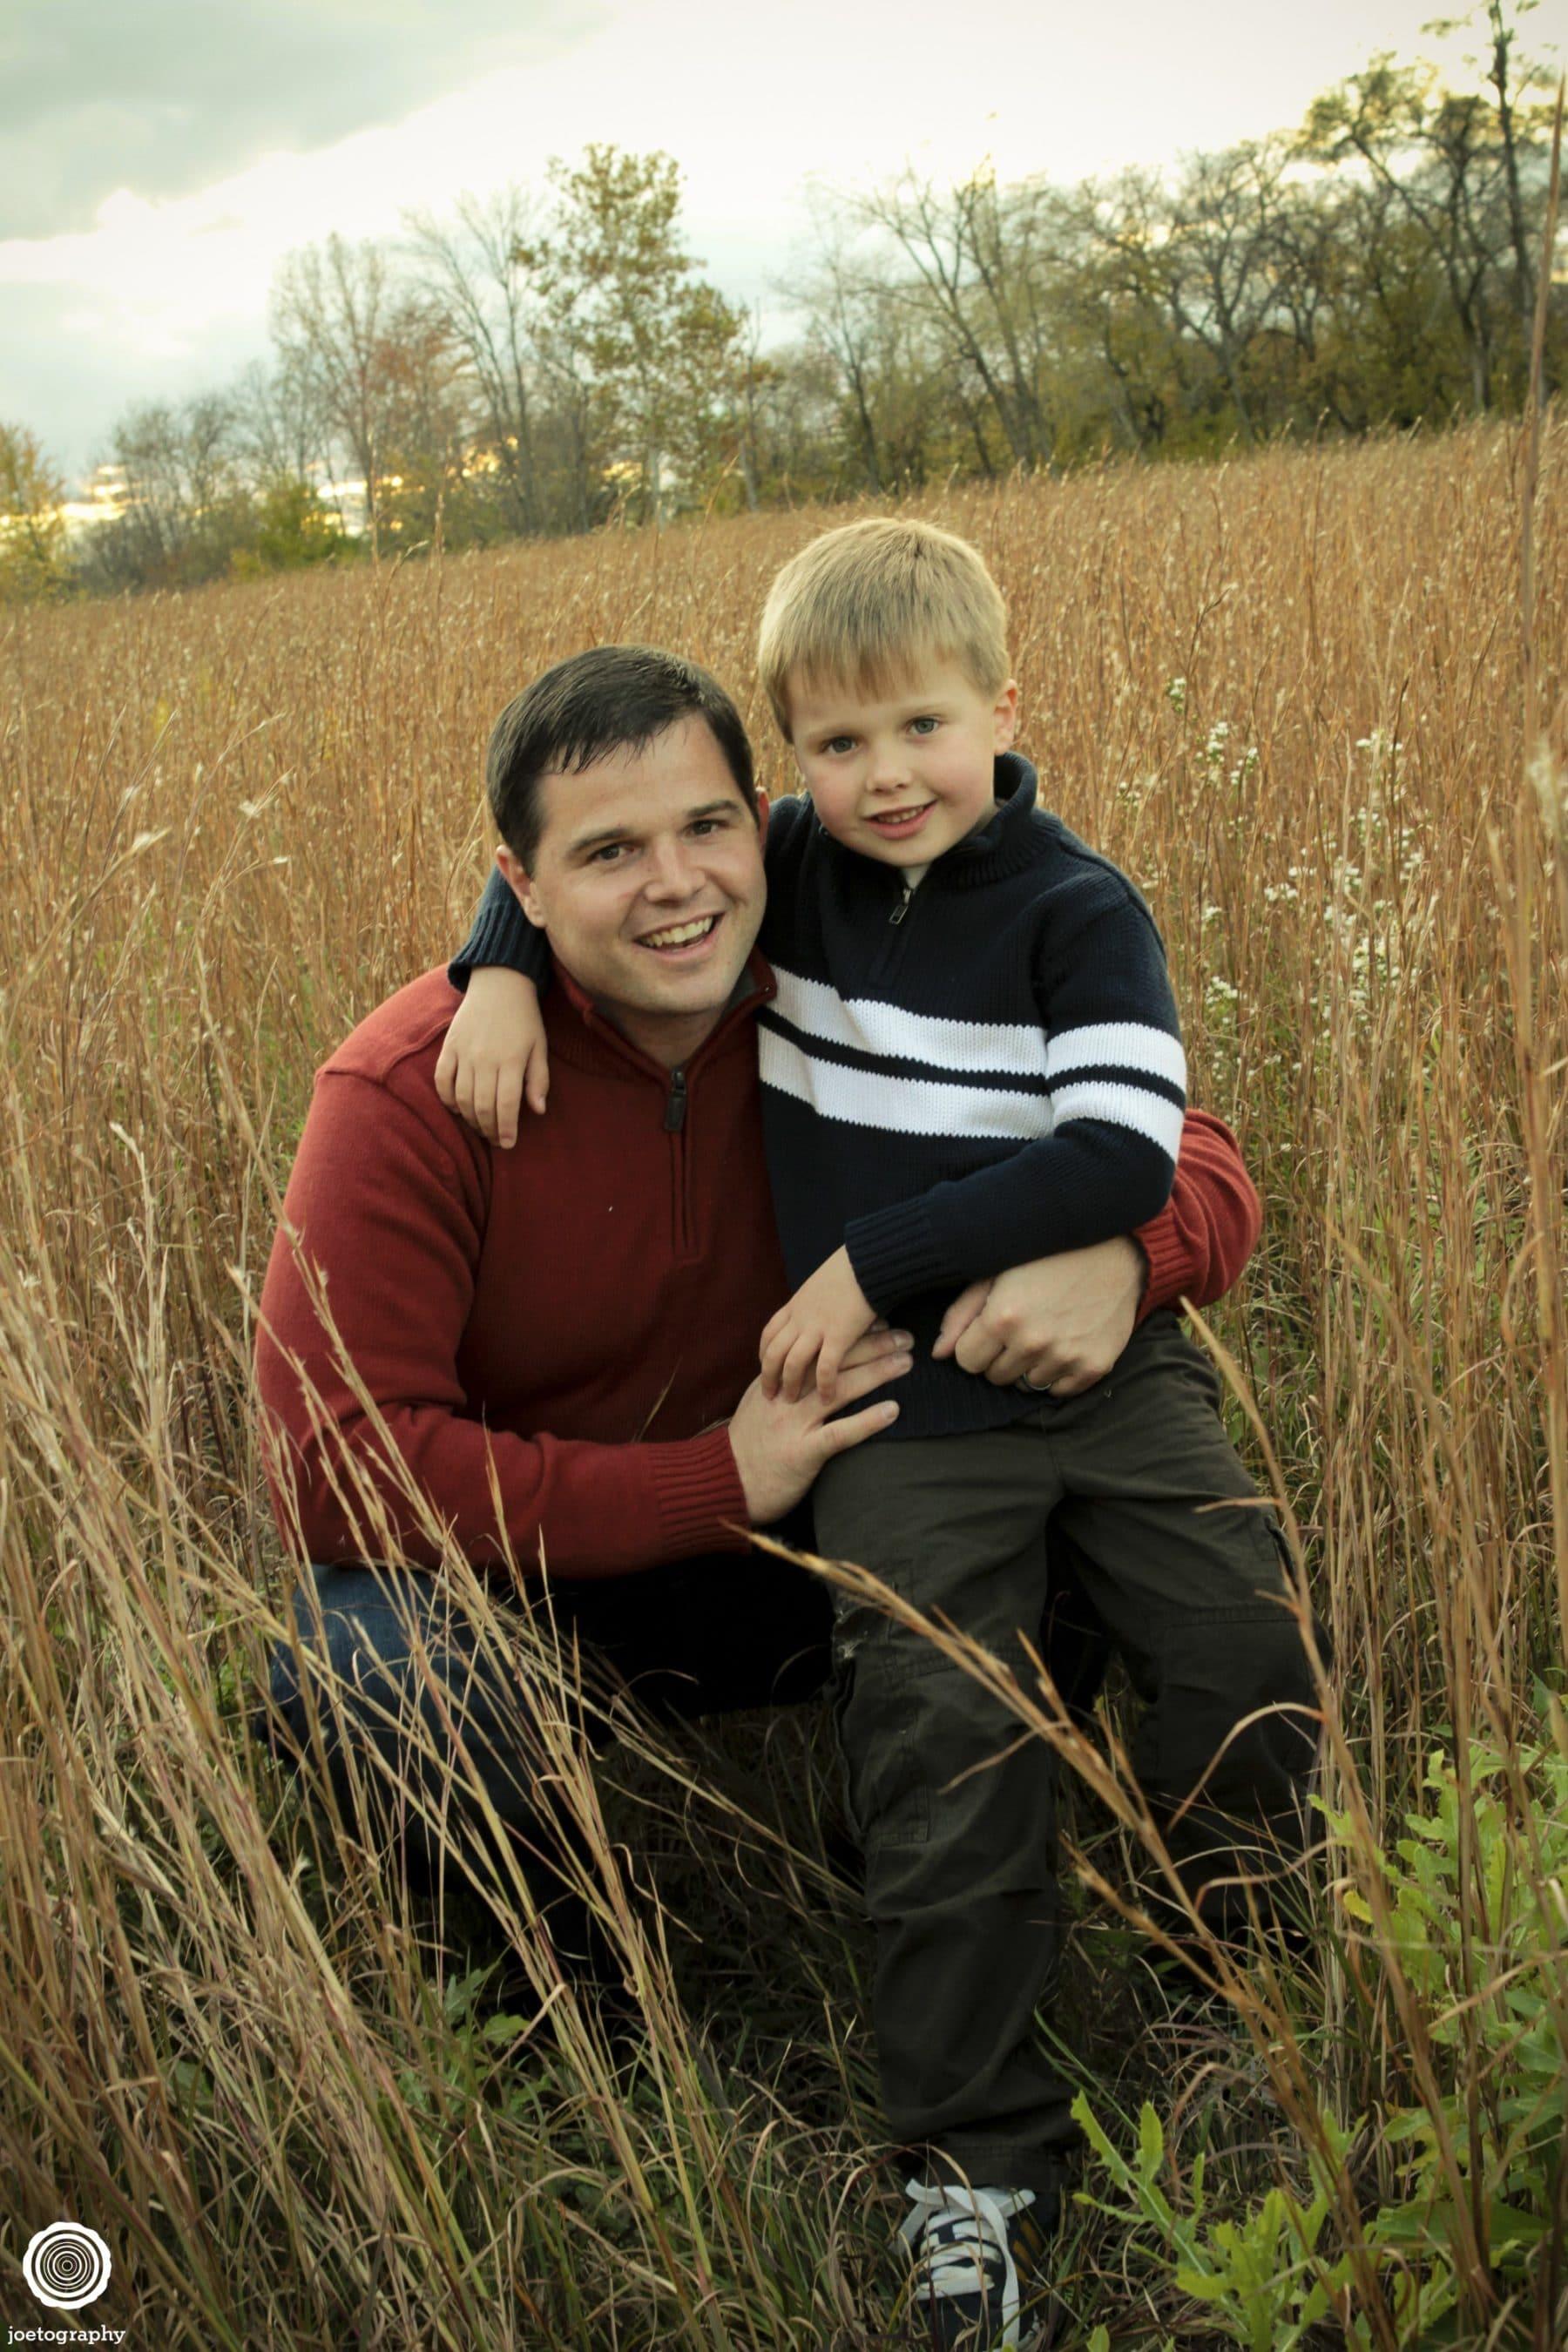 Albert-Family-Photographs-Fishers-Indiana-78